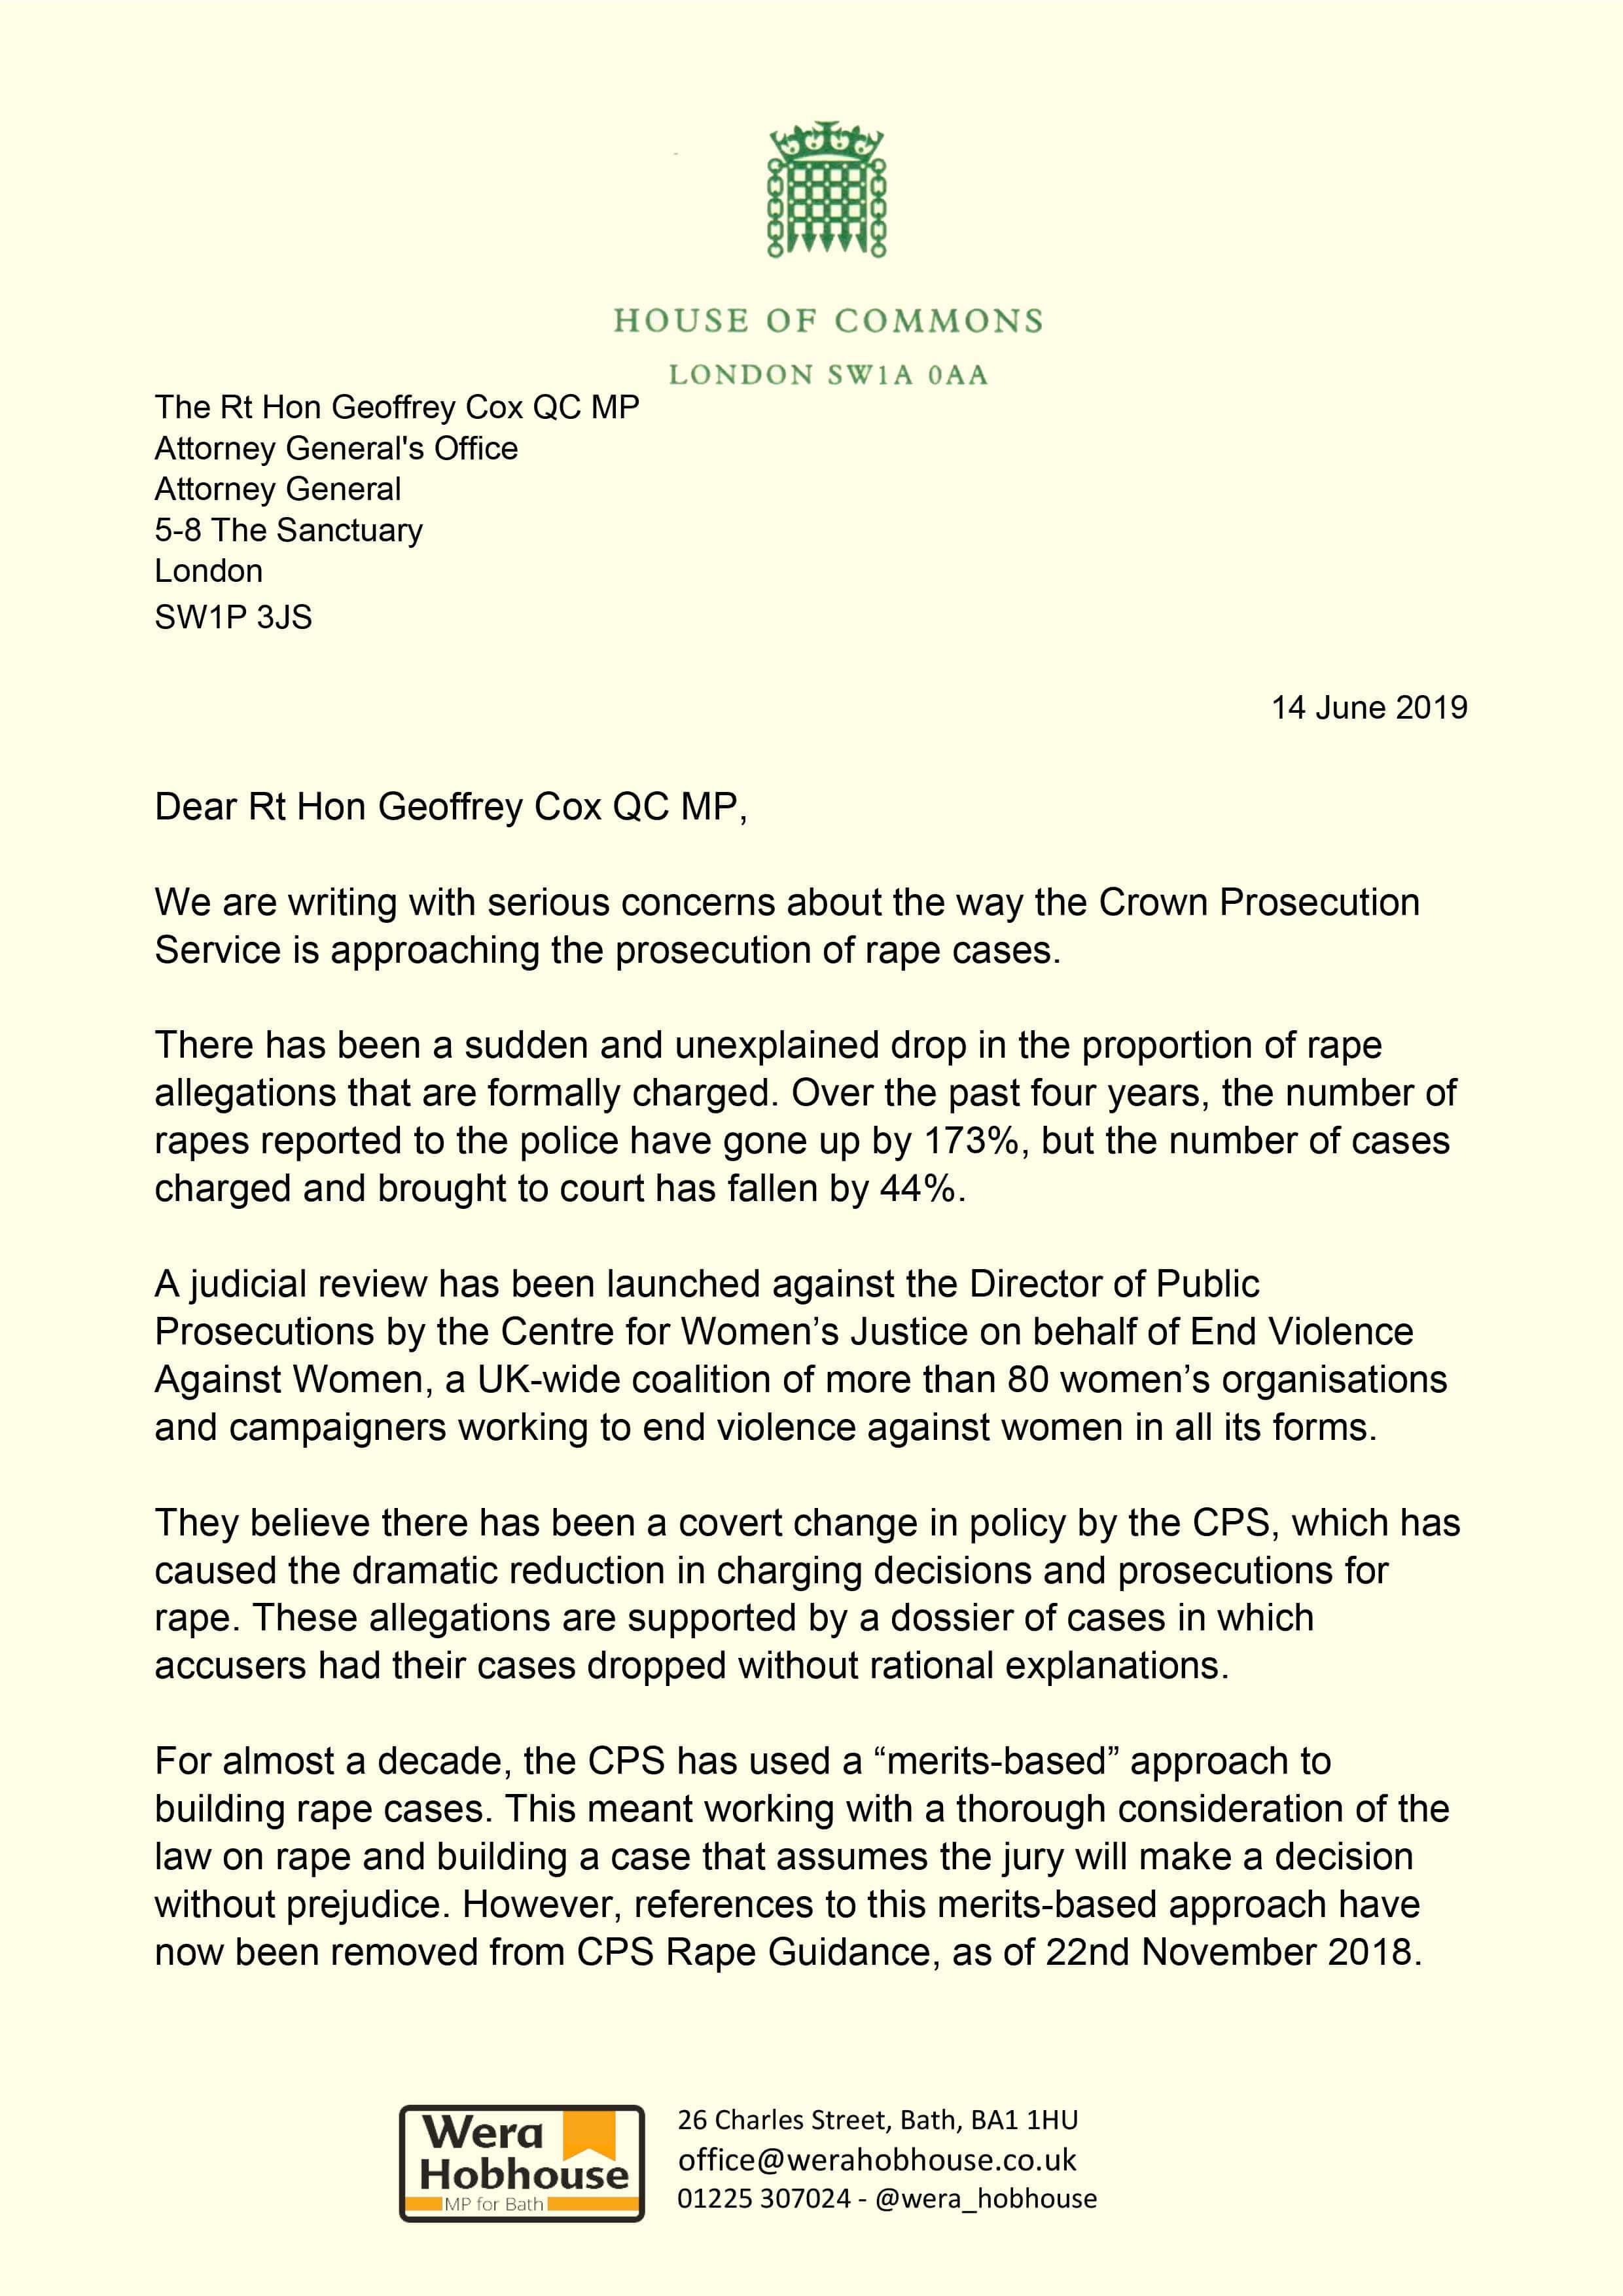 letter_to_Geoffrey_Cox-1.jpg